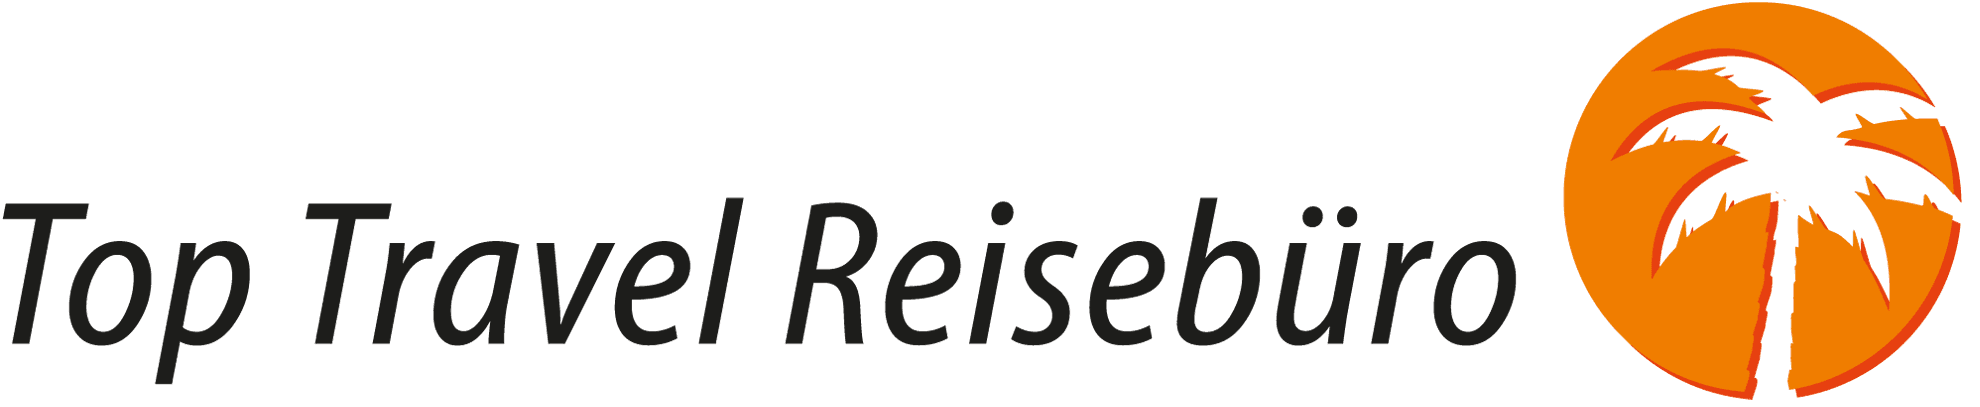 Top Travel Reisebüro GmbH